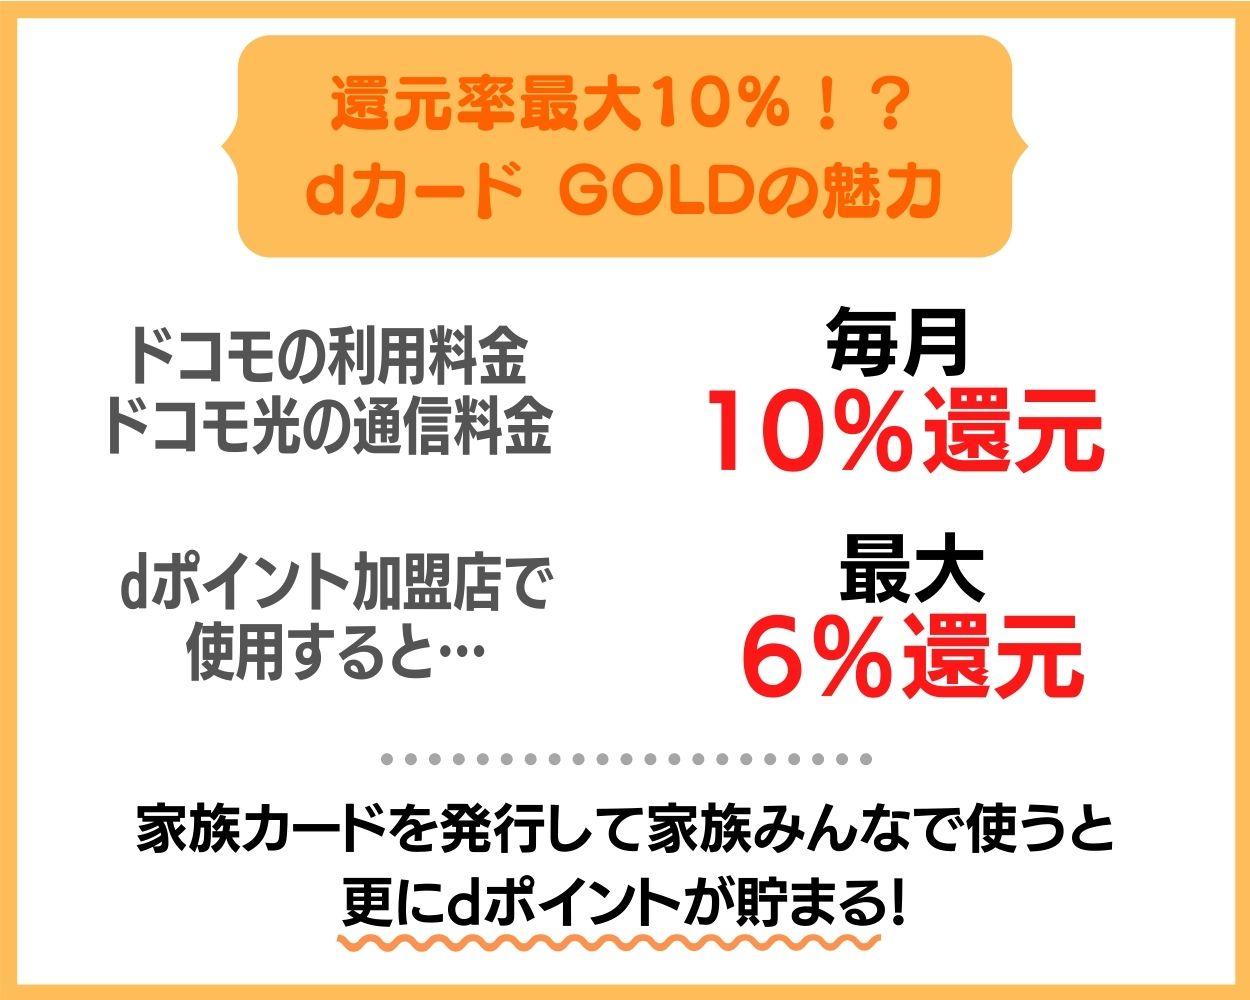 dカード GOLDの還元率は最大10%にもなる!お得な加盟店も紹介